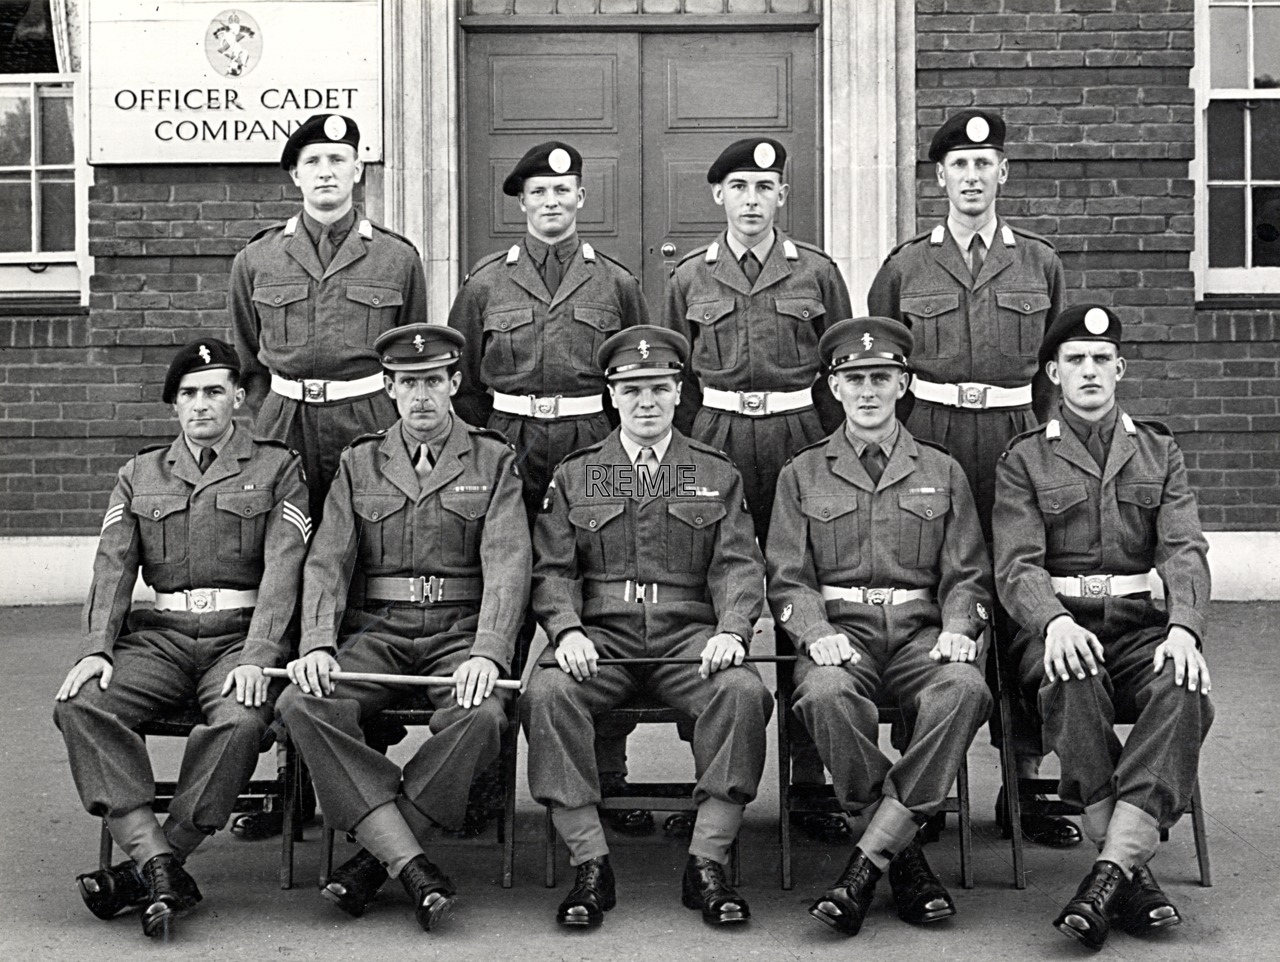 No 51, Cadet Officer General Course, Bordon: July 1957